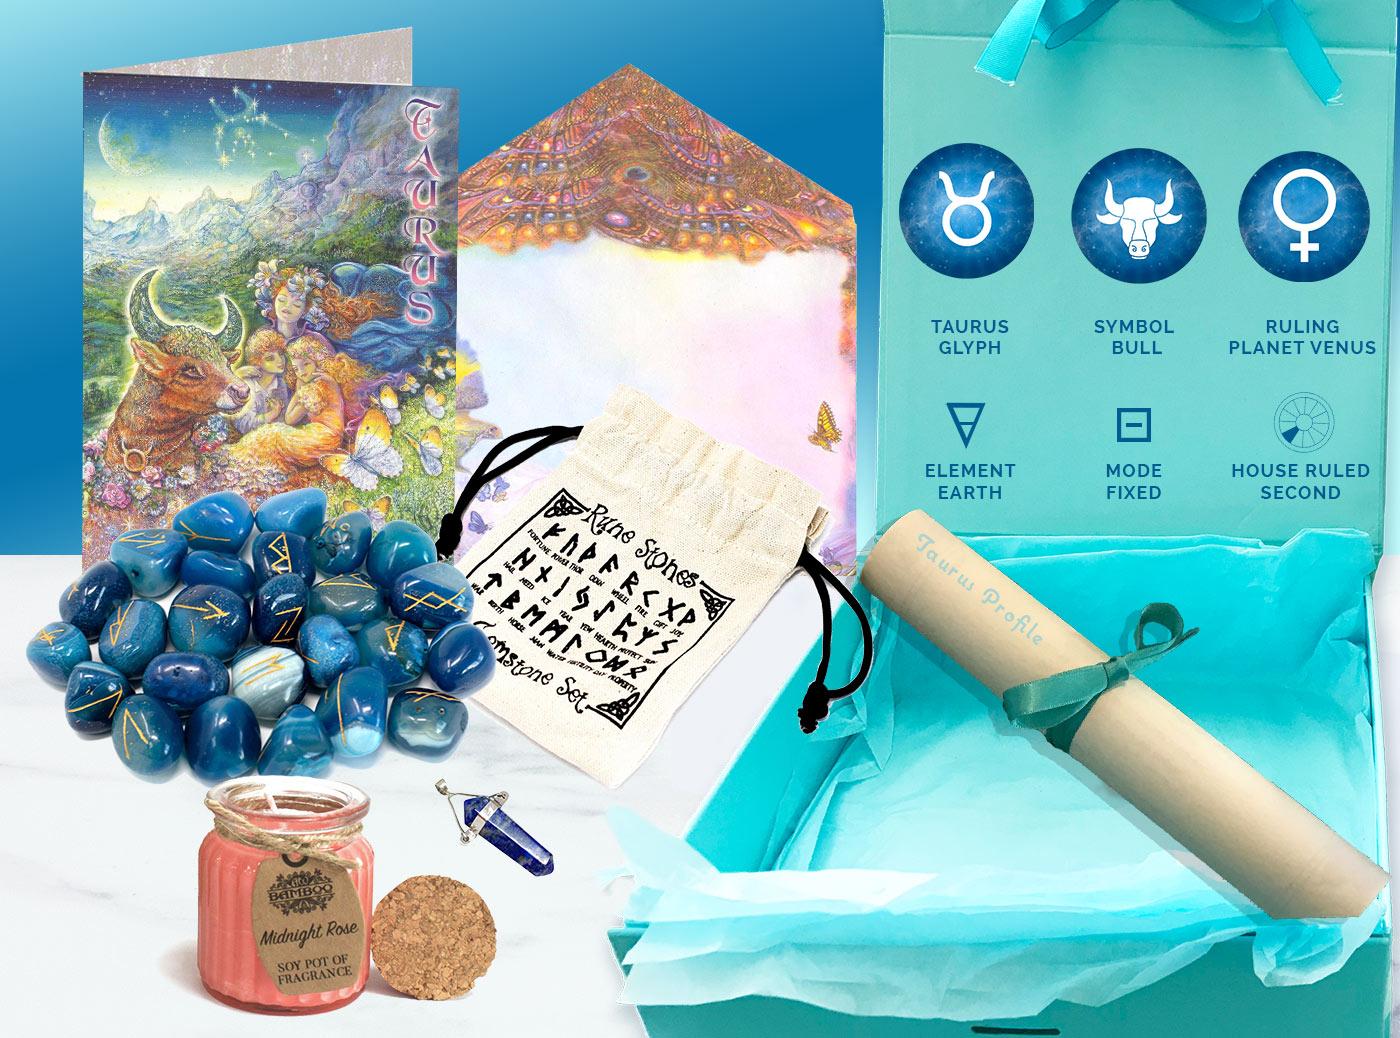 Taurus Gift Box and card